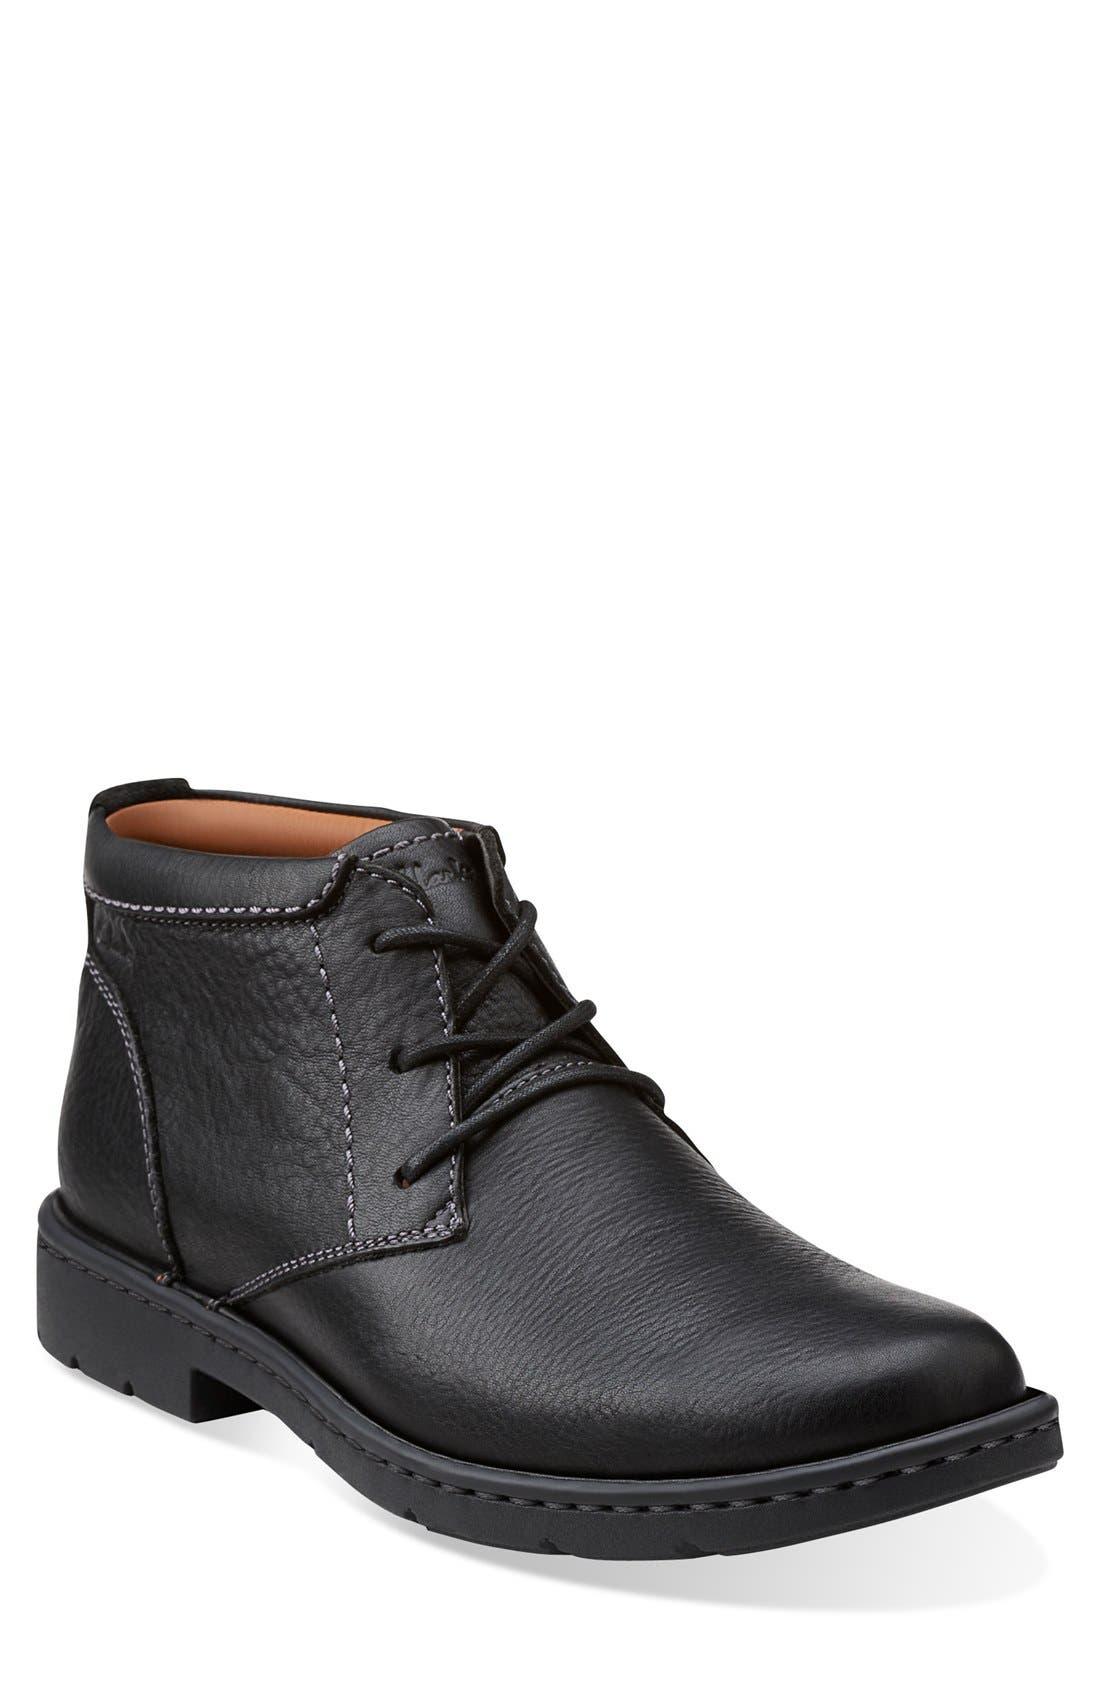 Clarks® 'Stratton - Limit' Plain Toe Boot (Men)